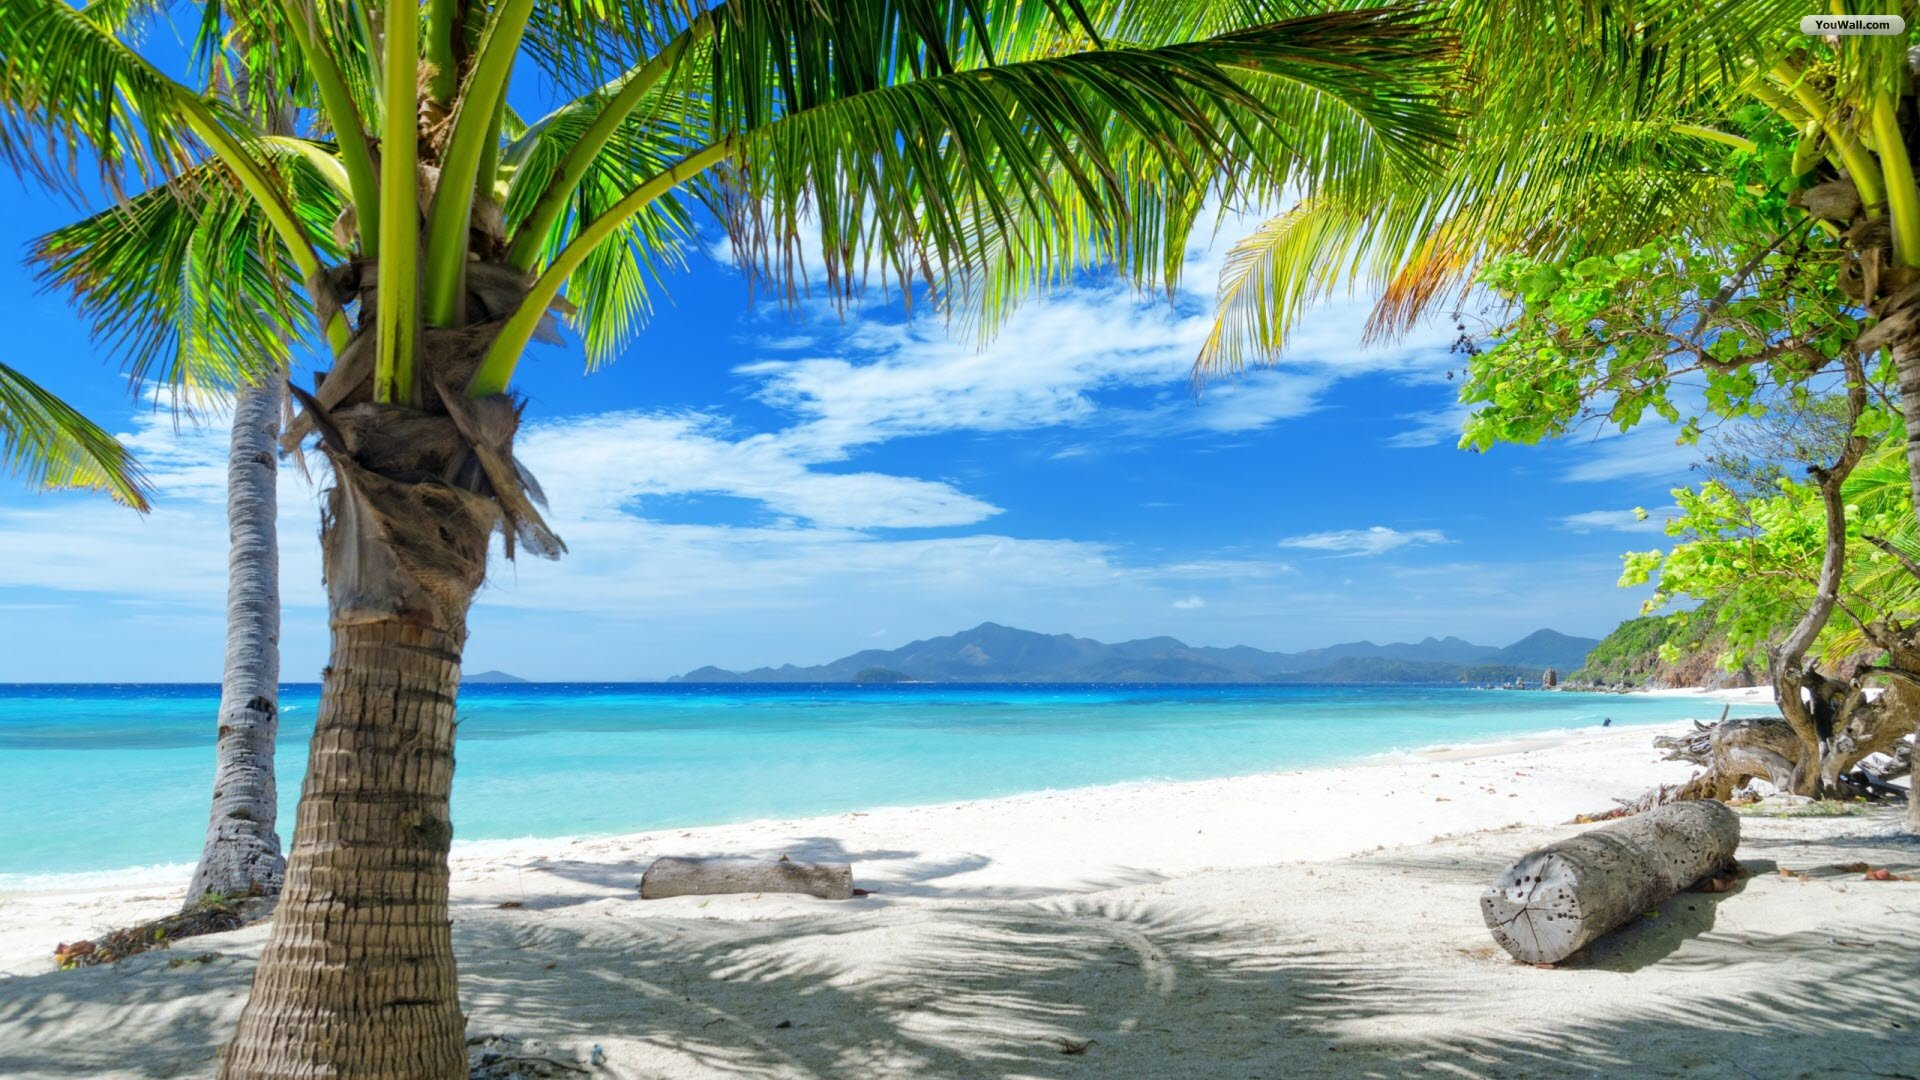 paradise beach wallpaper 909